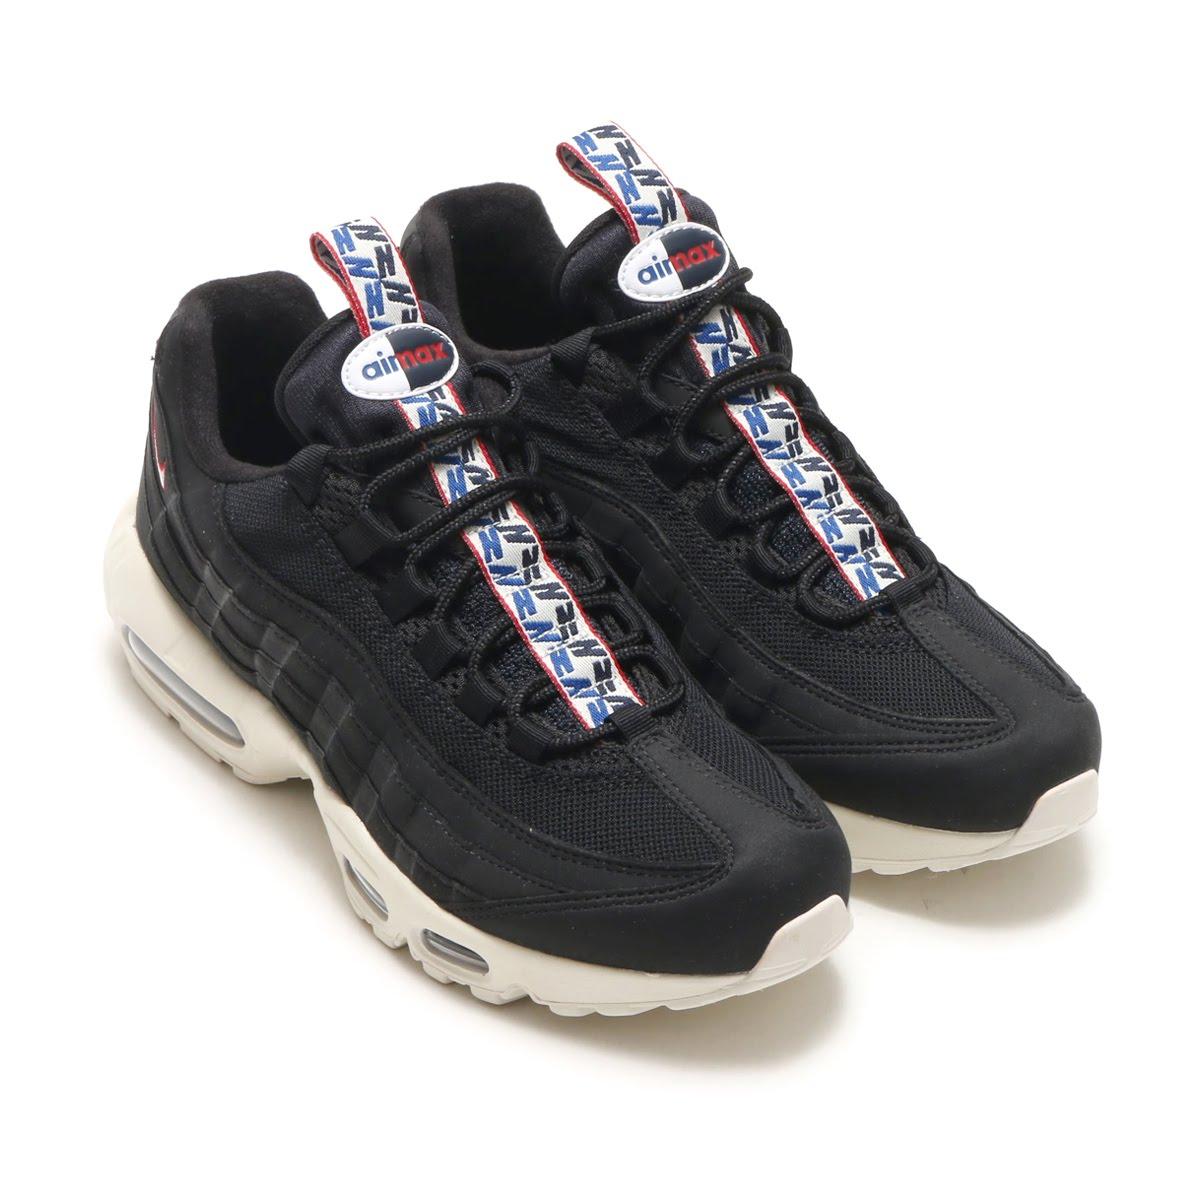 Japan Nike Shoes Shop